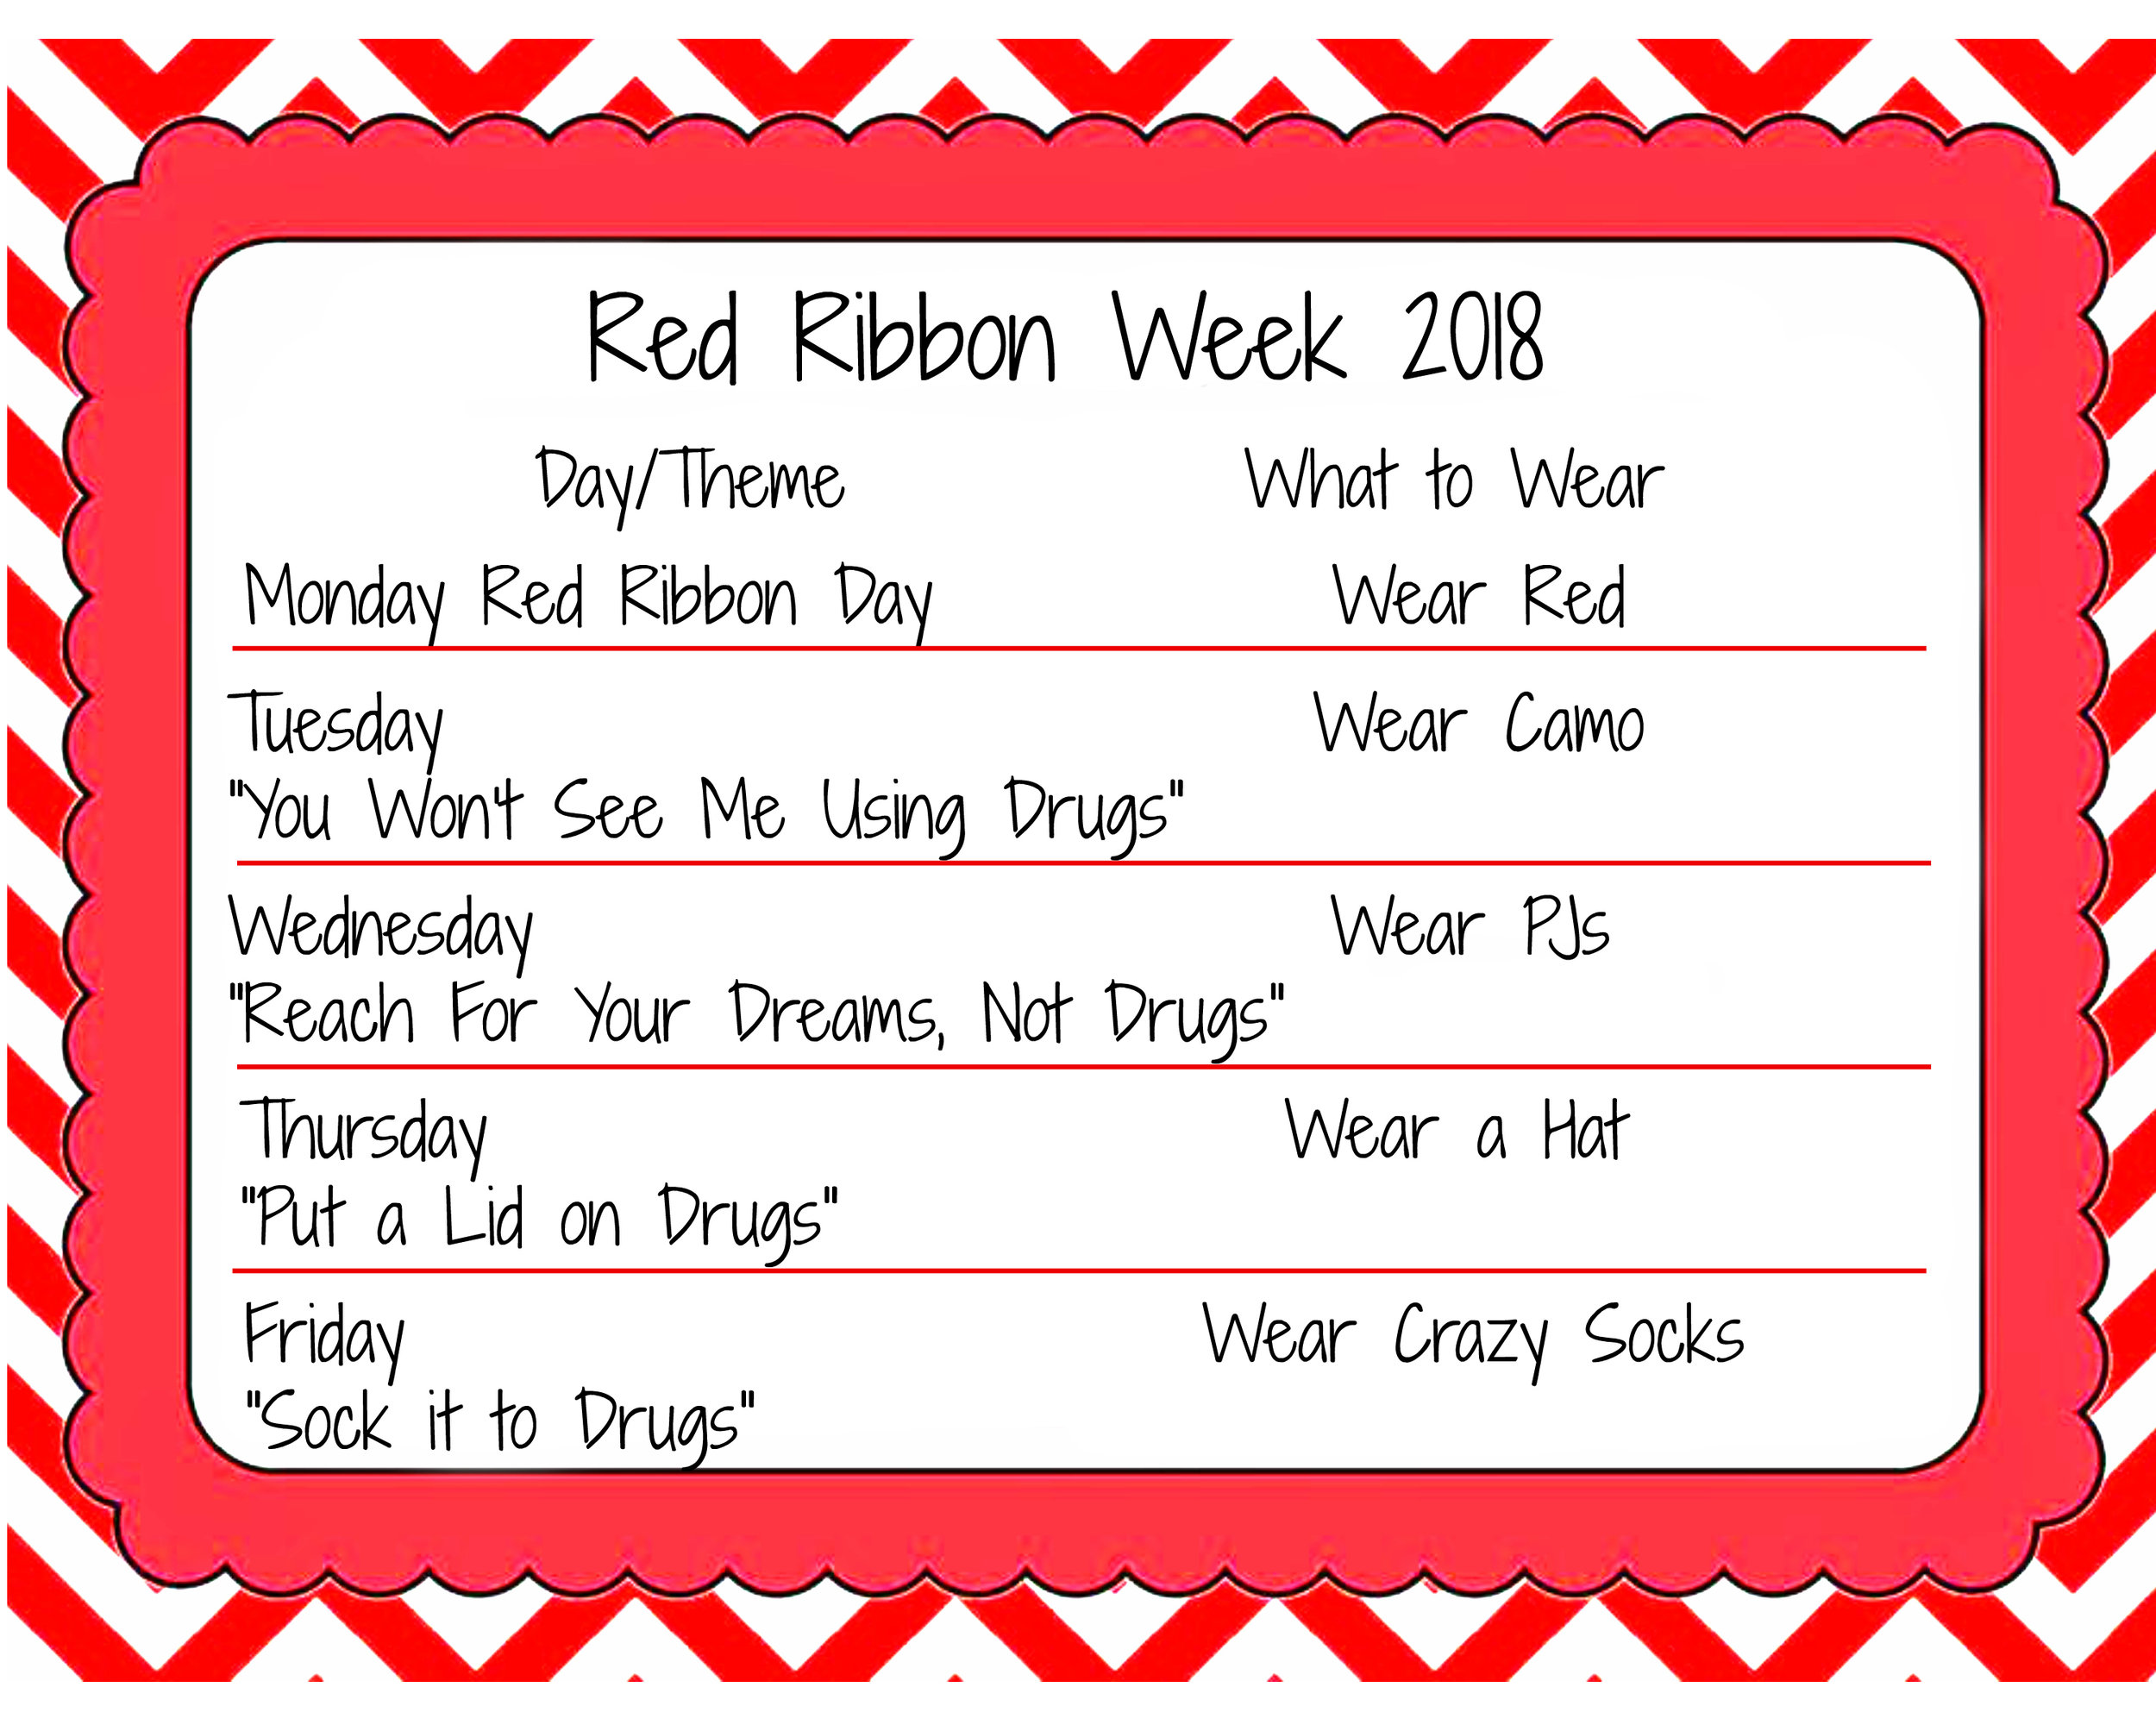 Red Ribbon Week 2018.jpg